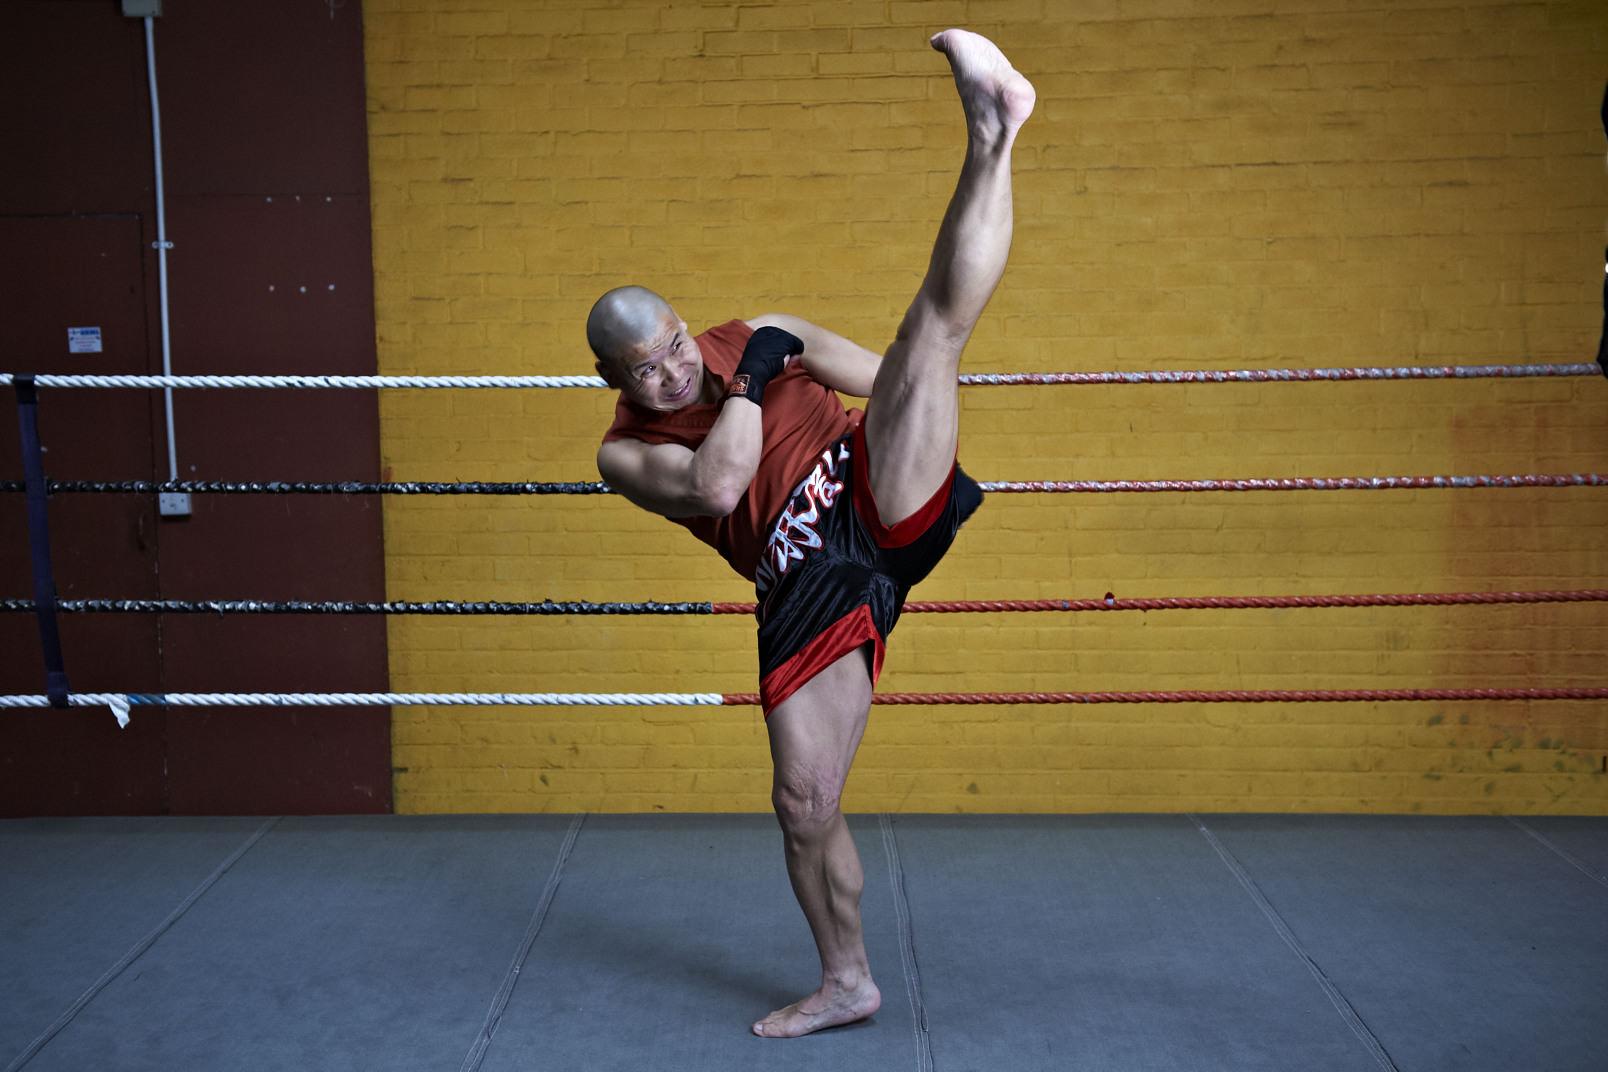 Shaolin temple uk shifu yanzi kick 19.jpg